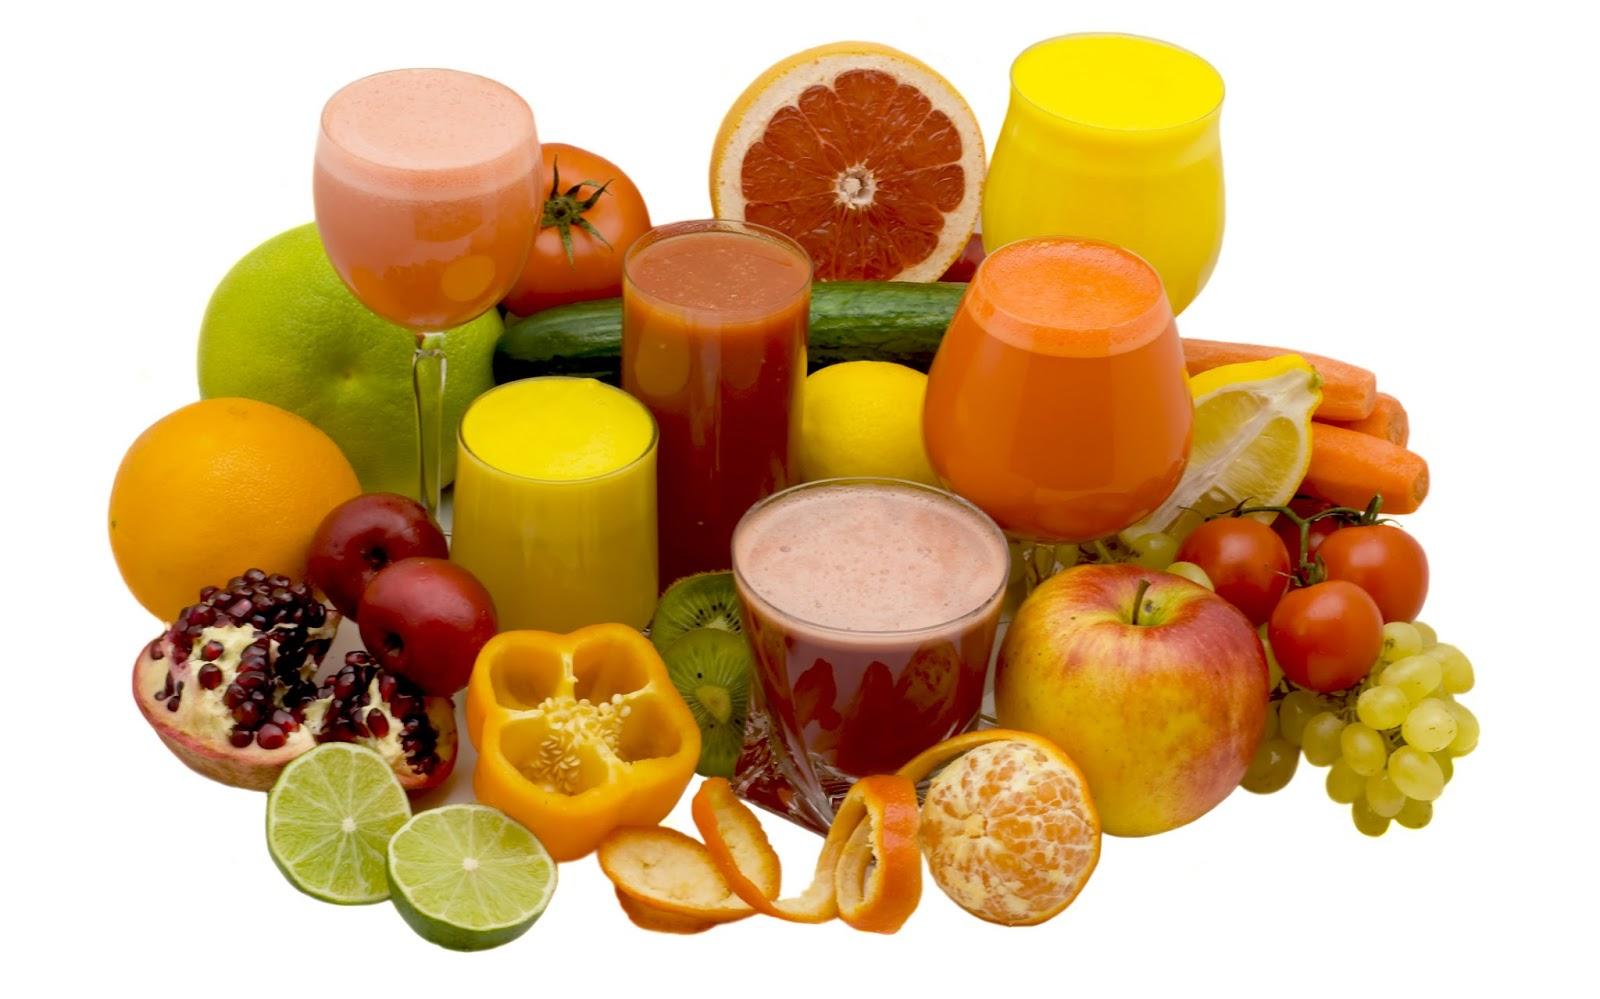 Slow Juicer Untuk Usaha : YWM: Usaha Minuman Aneka Jus Buah